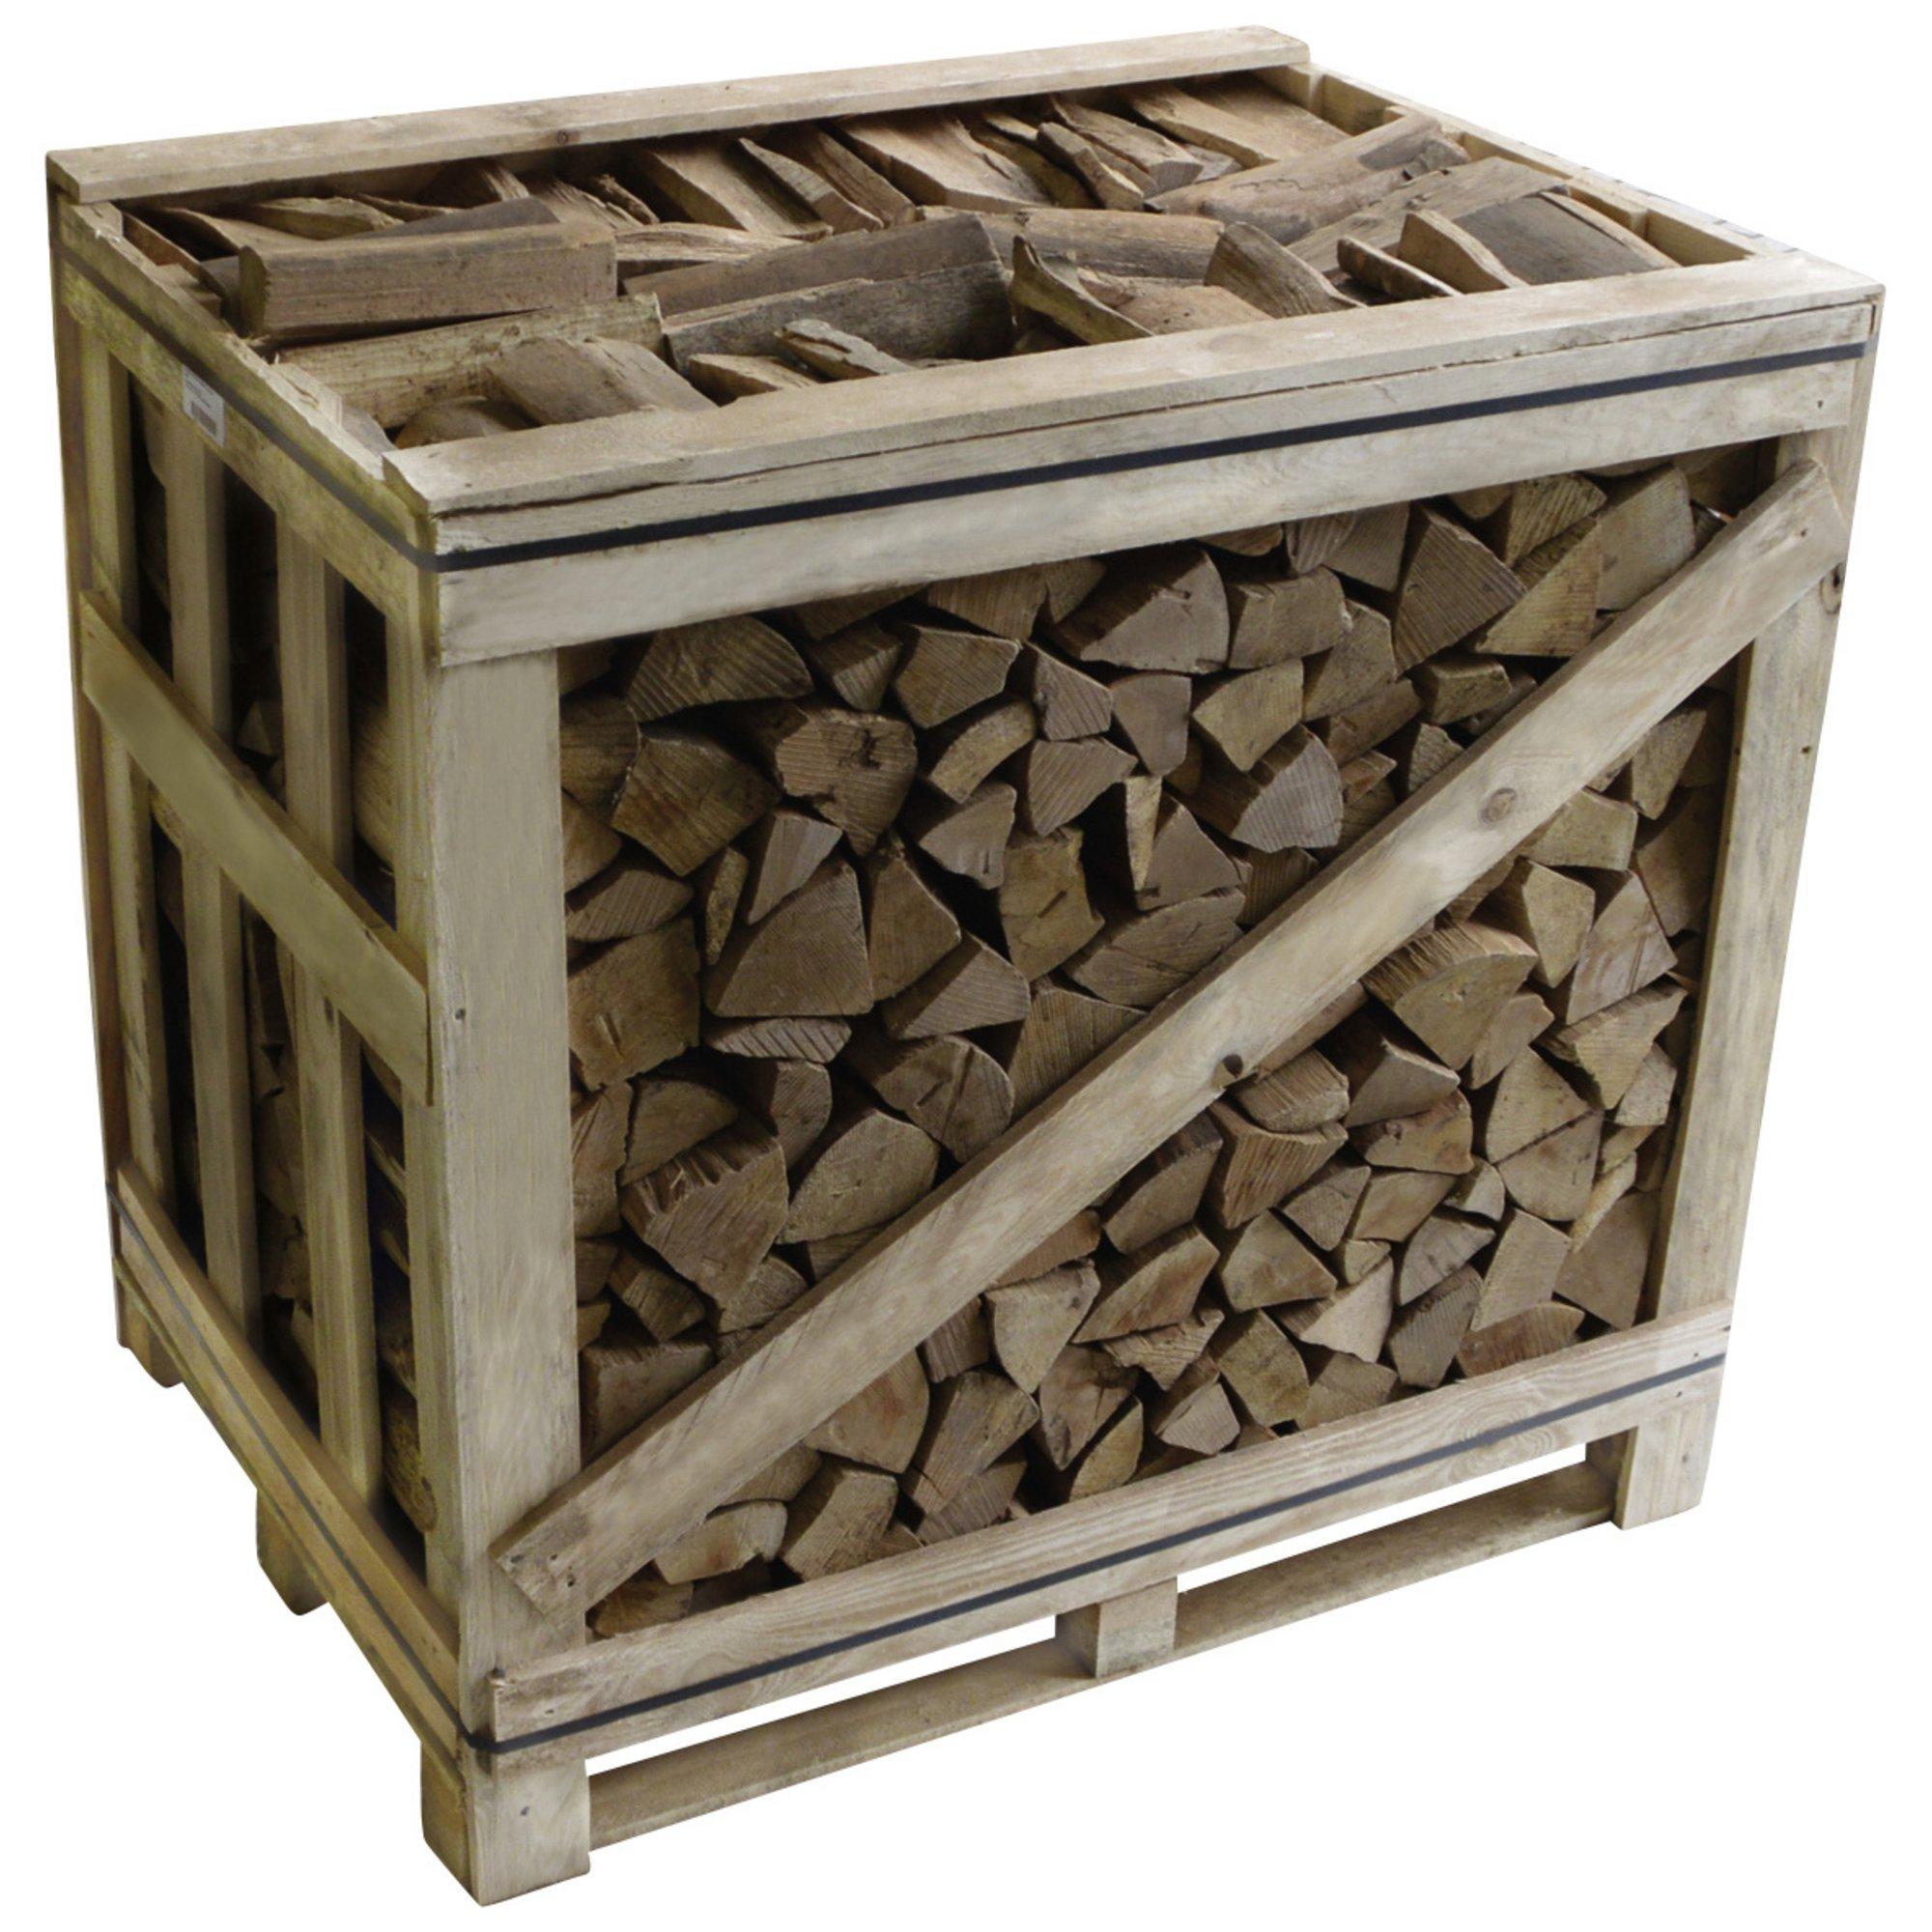 Buche Holzbox